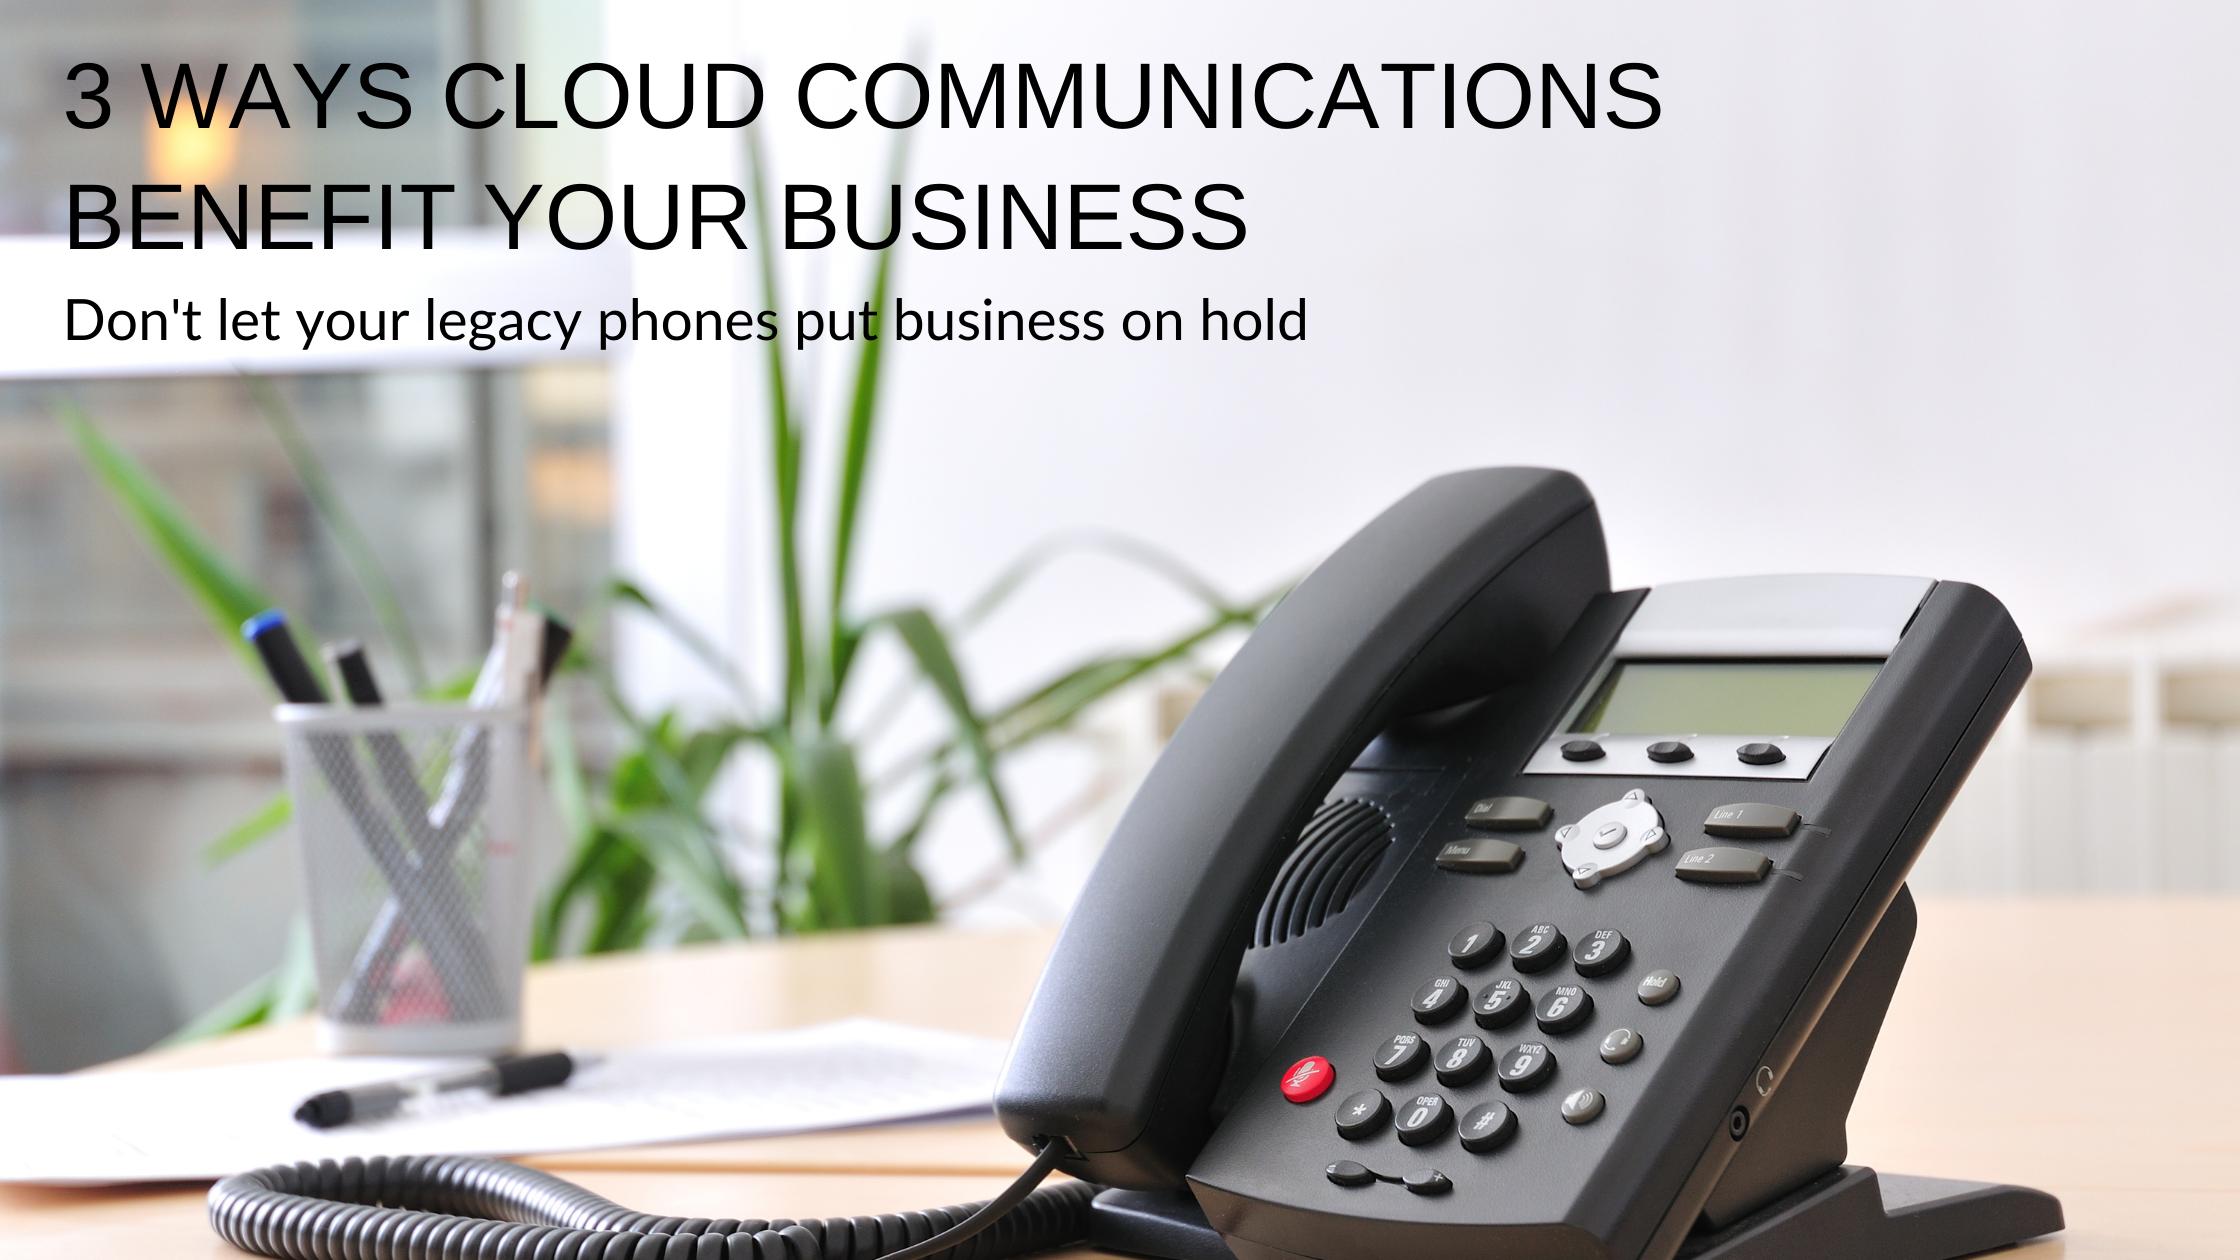 3 Ways Cloud Communications Benefit Your Business